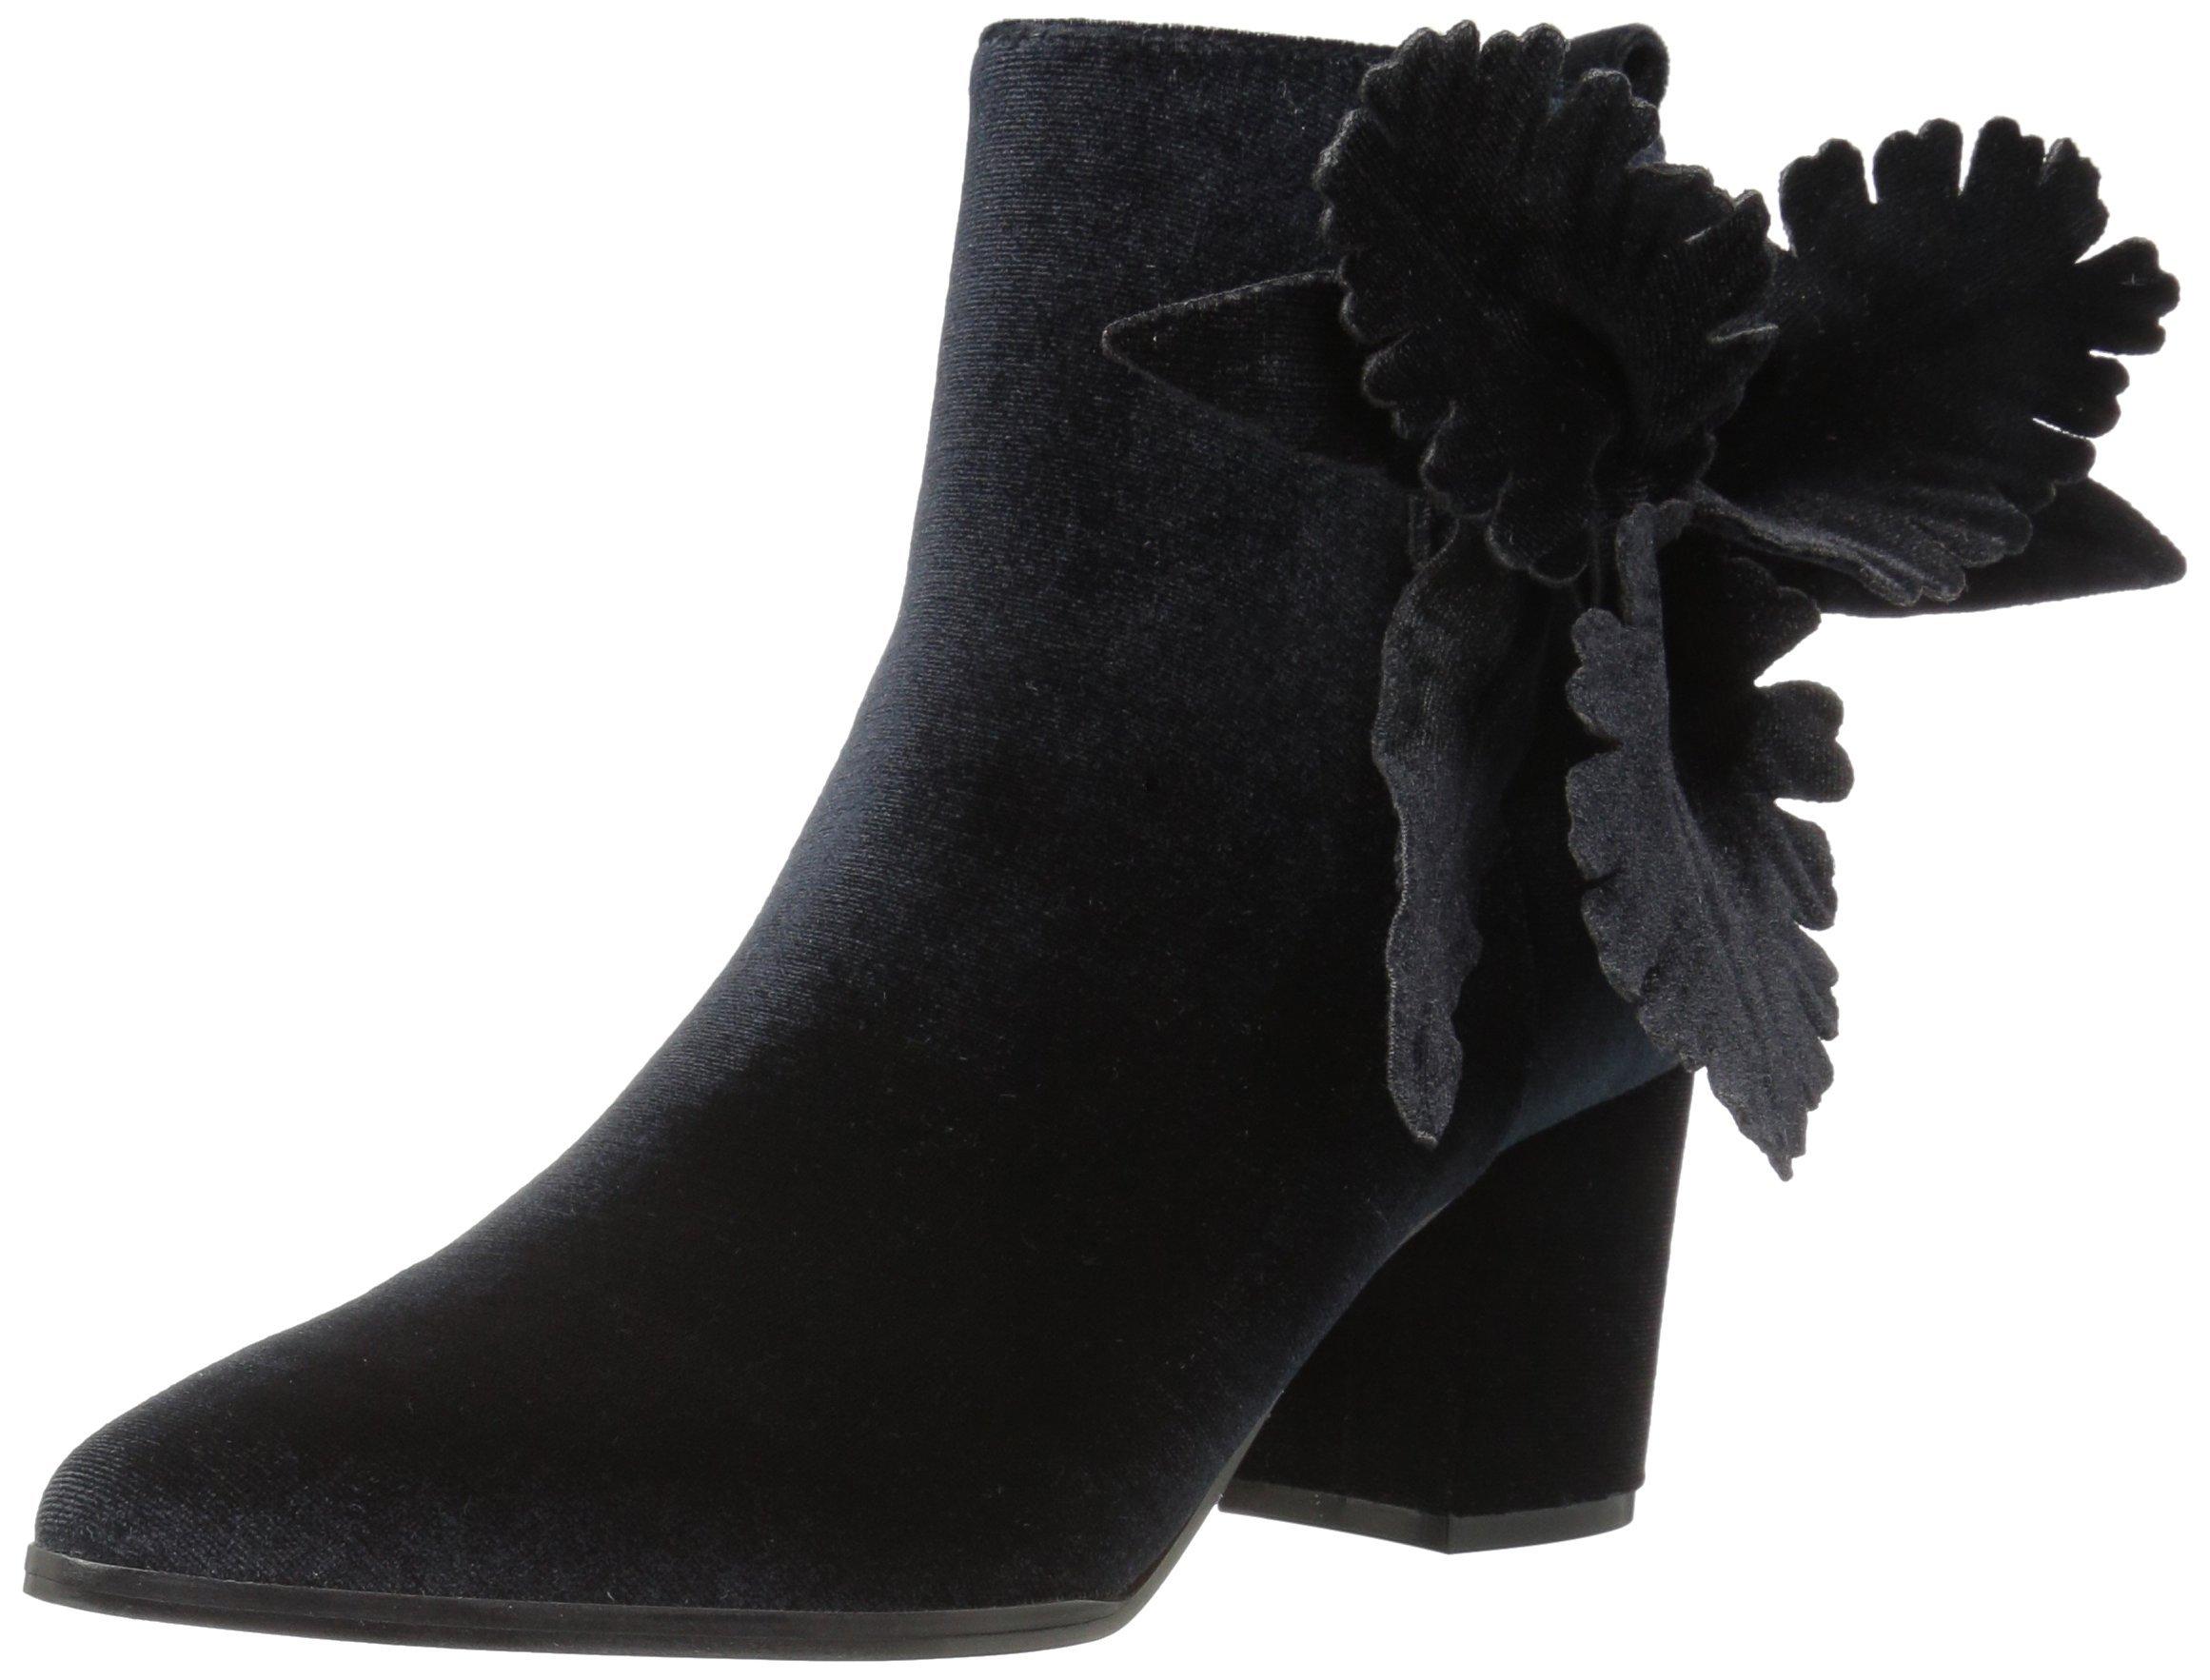 Cecelia New York Women's Mirah Fashion Boot, Black, 8 Medium US by Cecelia New York